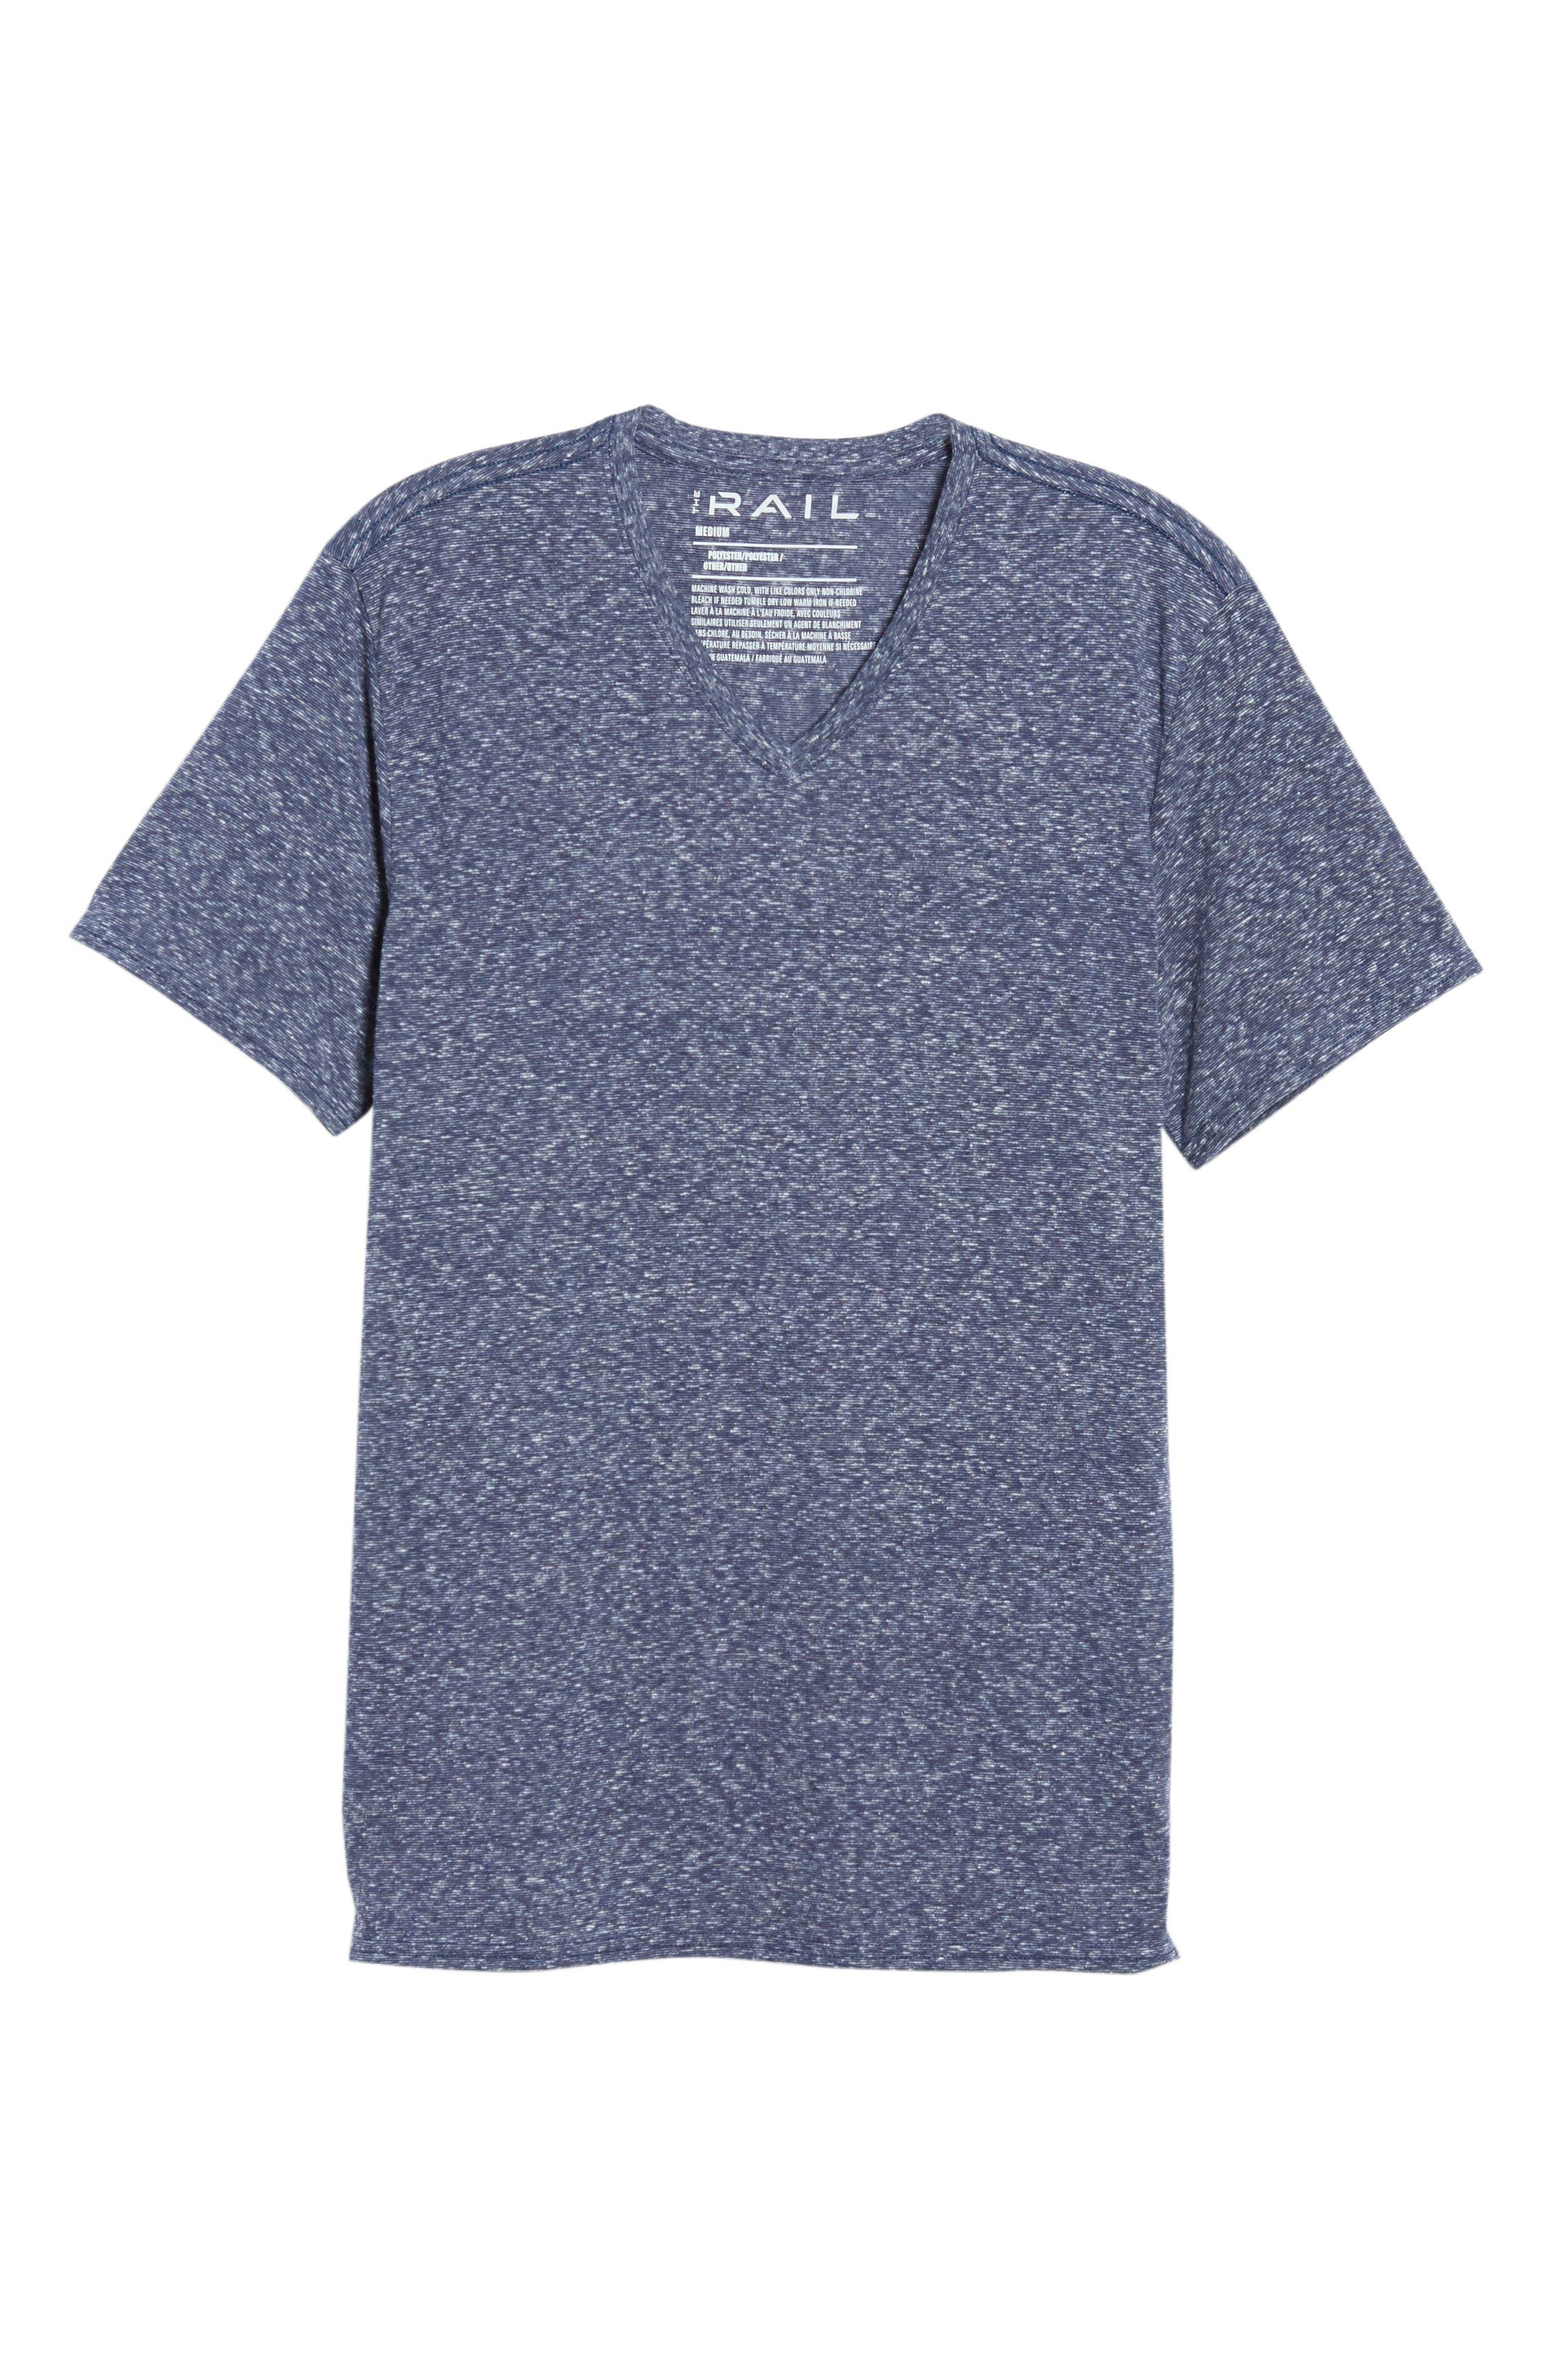 Jersey V-Neck T-Shirt,                             Alternate thumbnail 6, color,                             410